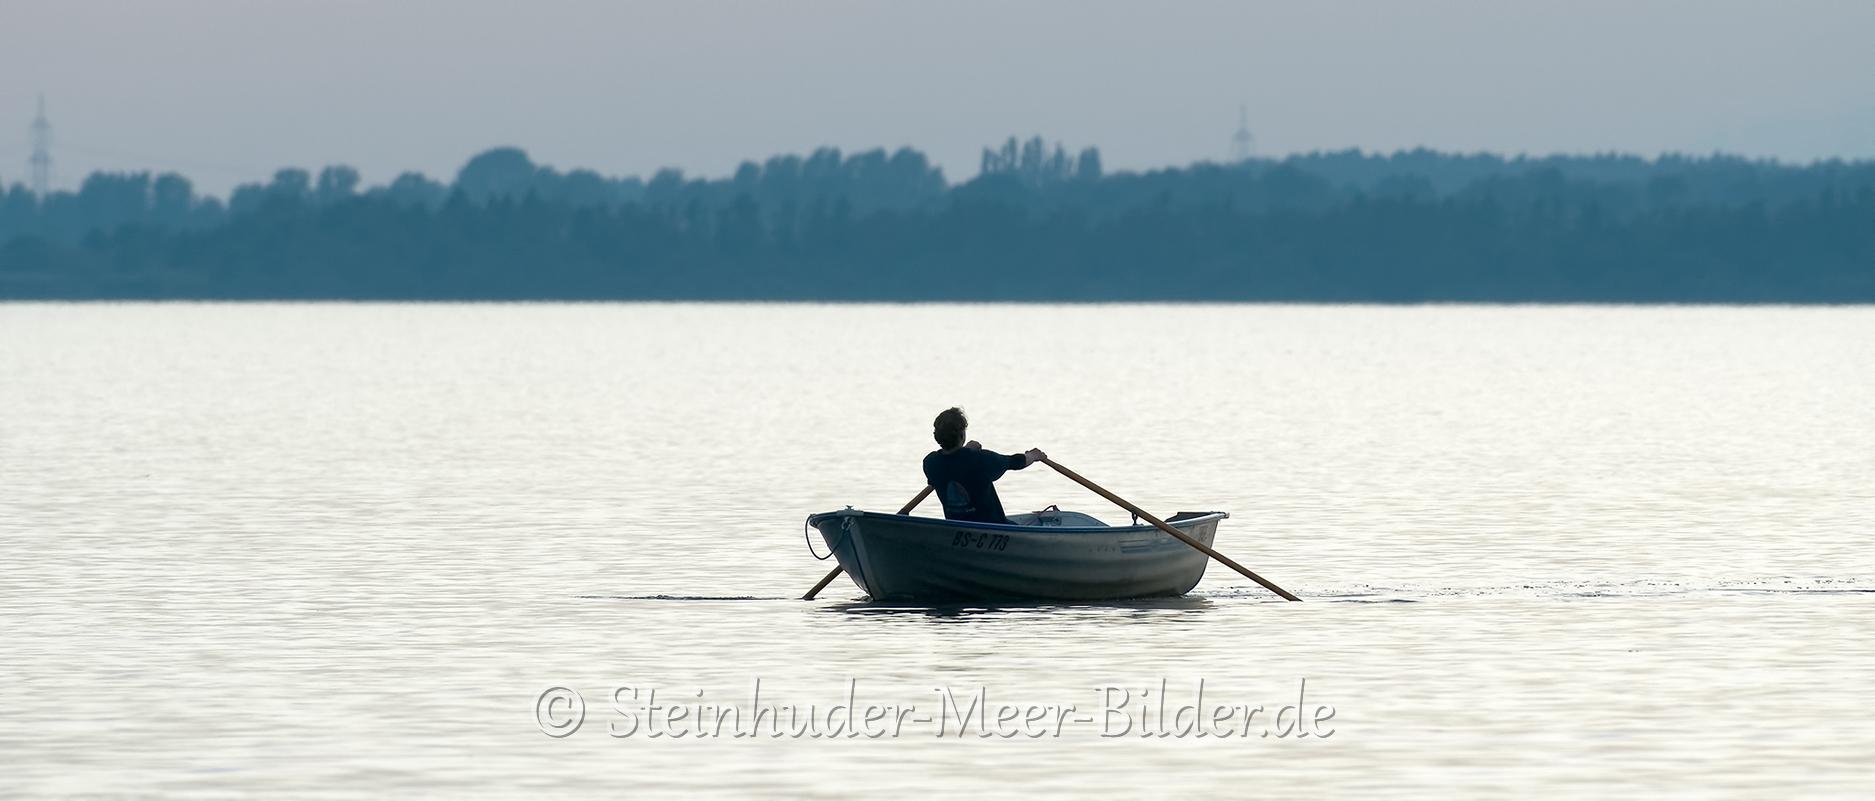 ruderer-ruderboot-silhouette-bilder-landschaften-steinhuder-meer-fotos-Panorama-A_NIK500_3896